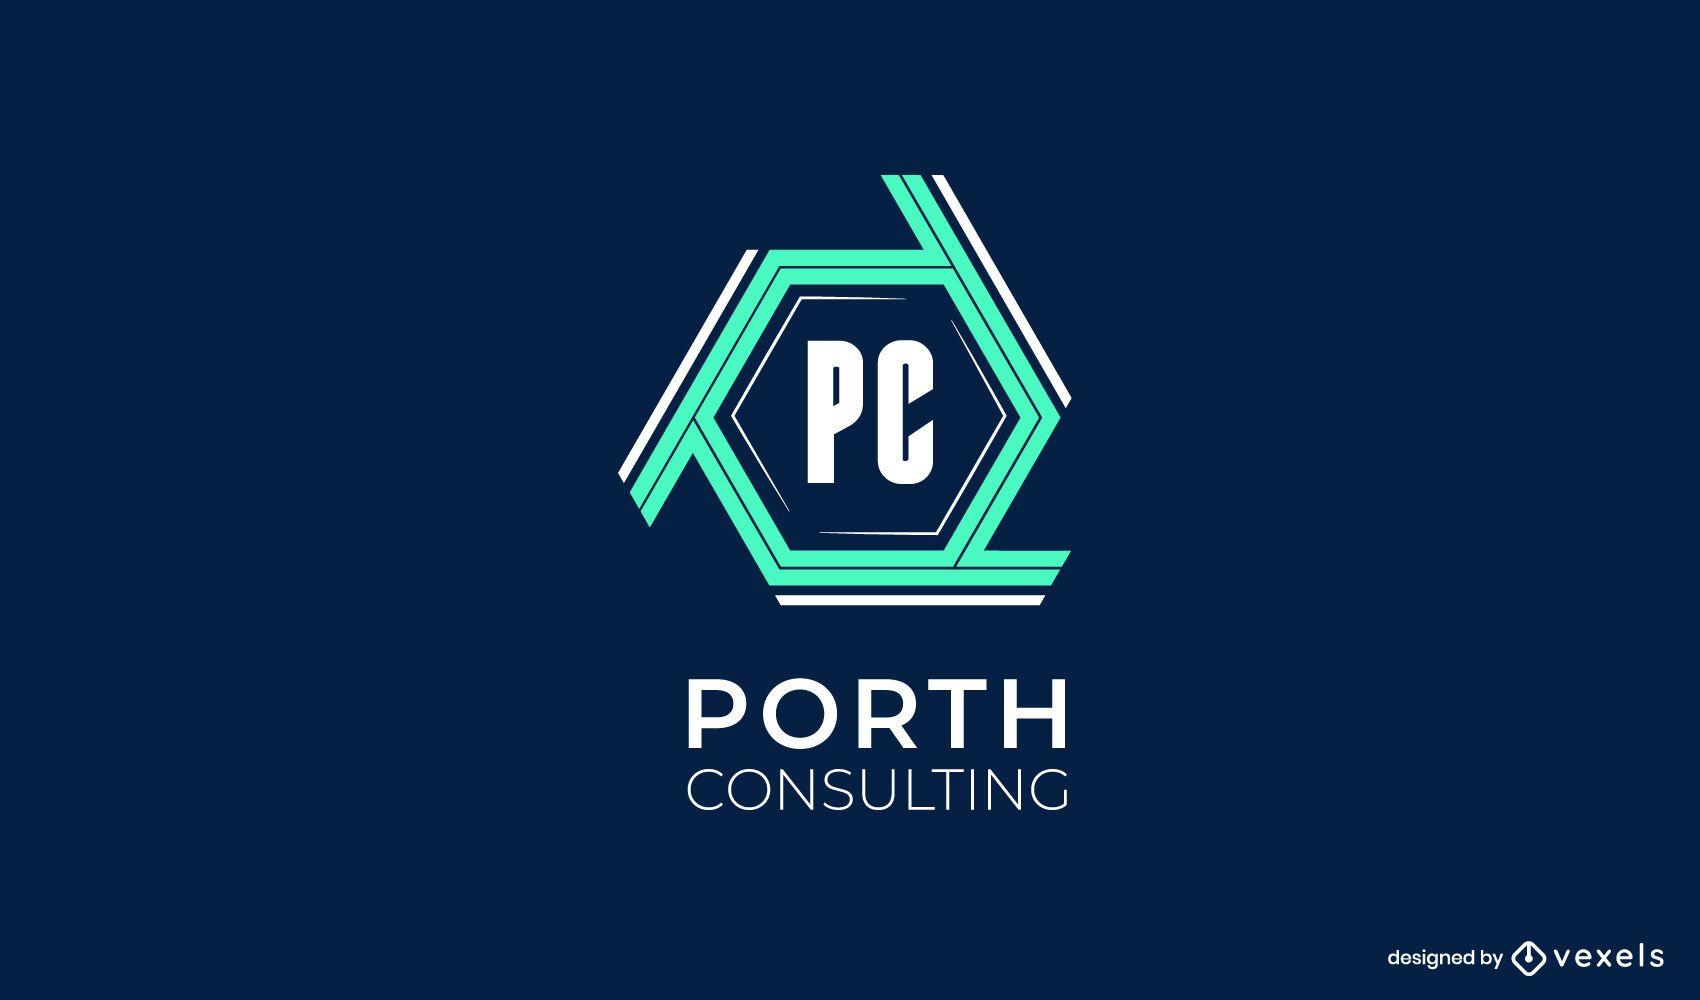 Porth Consulting Logo Design